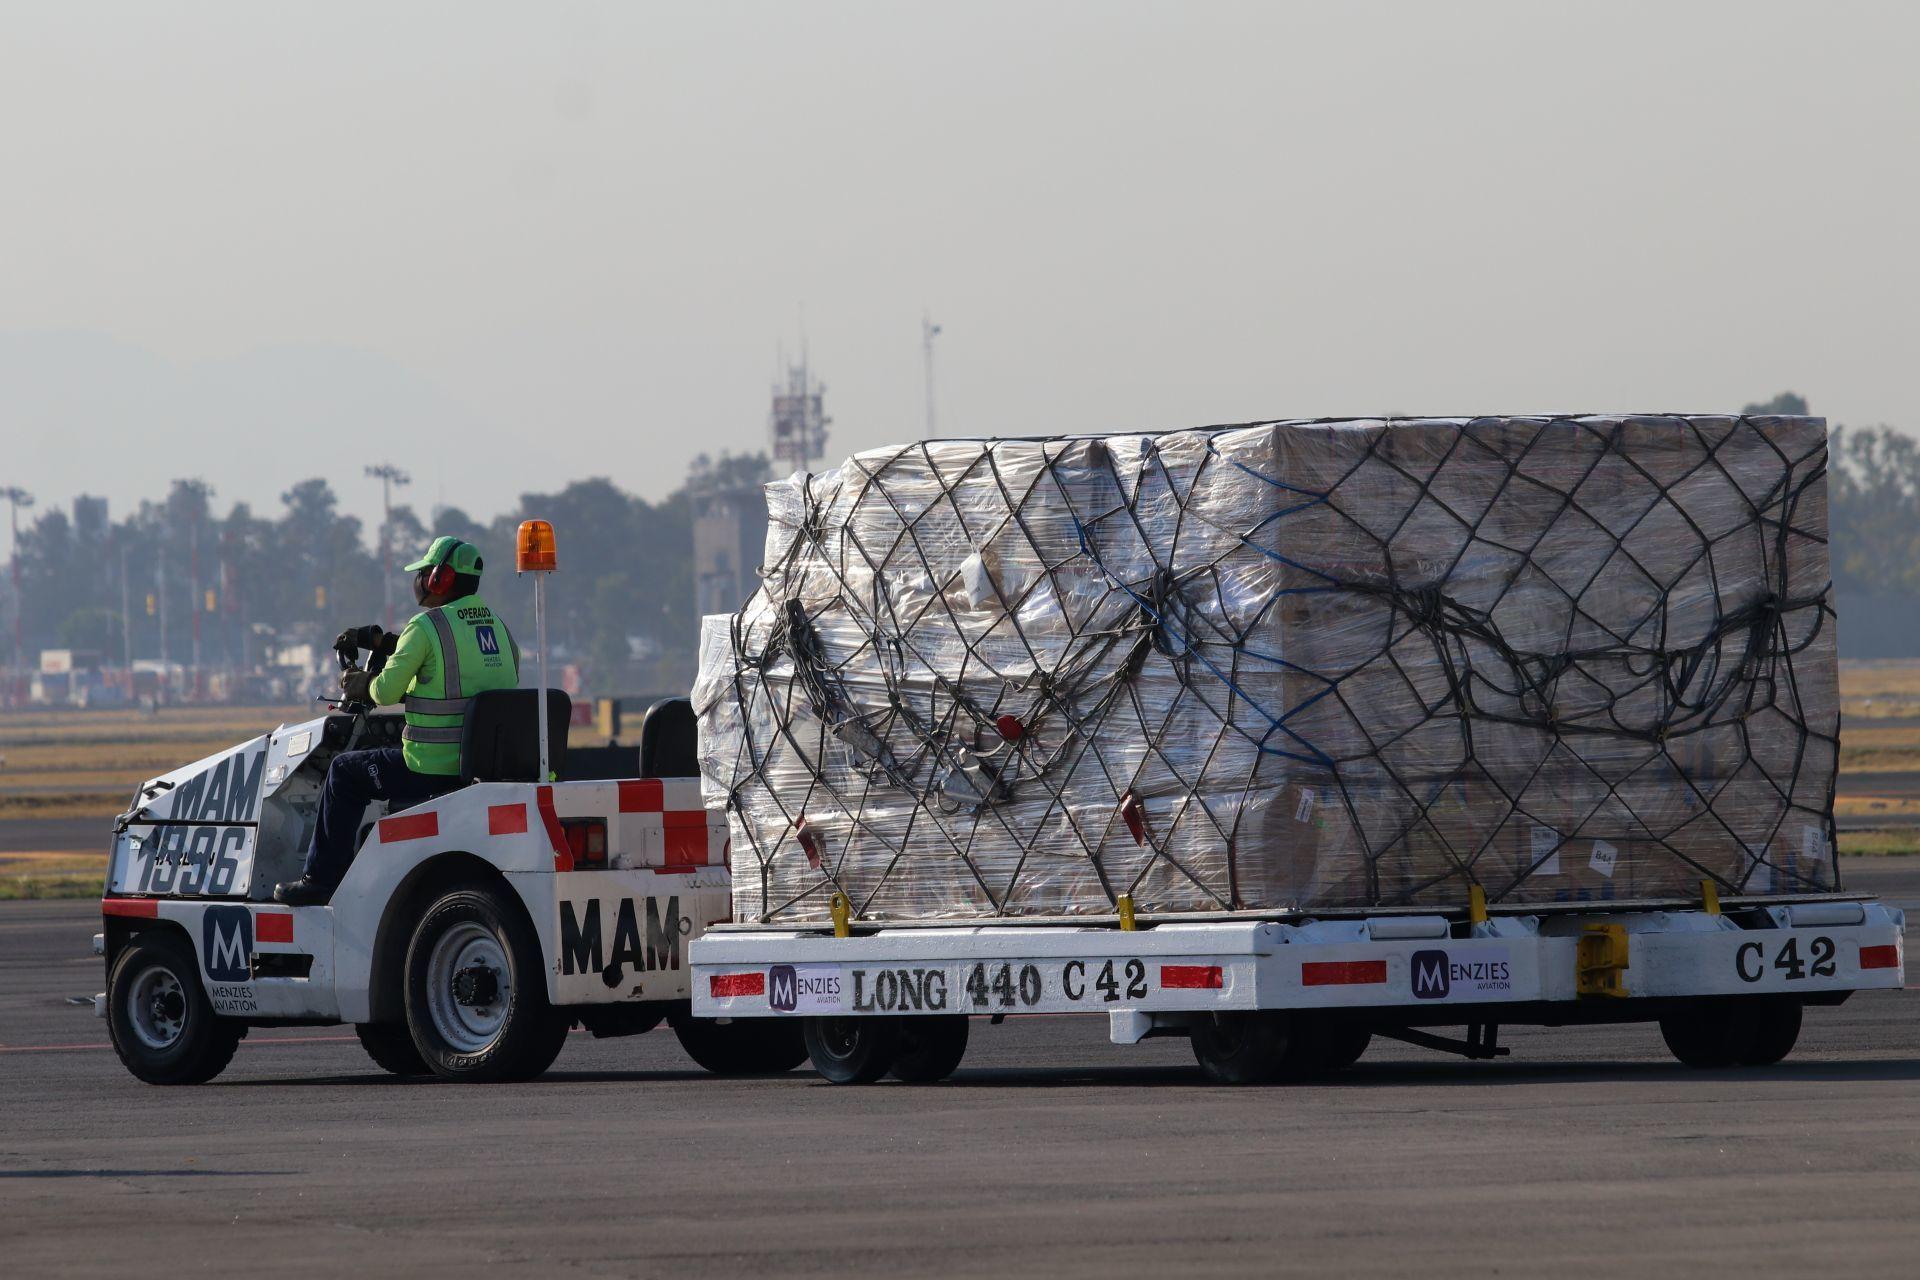 Llegan a México 200 mil dosis de CoronaVac, la vacuna china contra COVID-19 de Sinovac